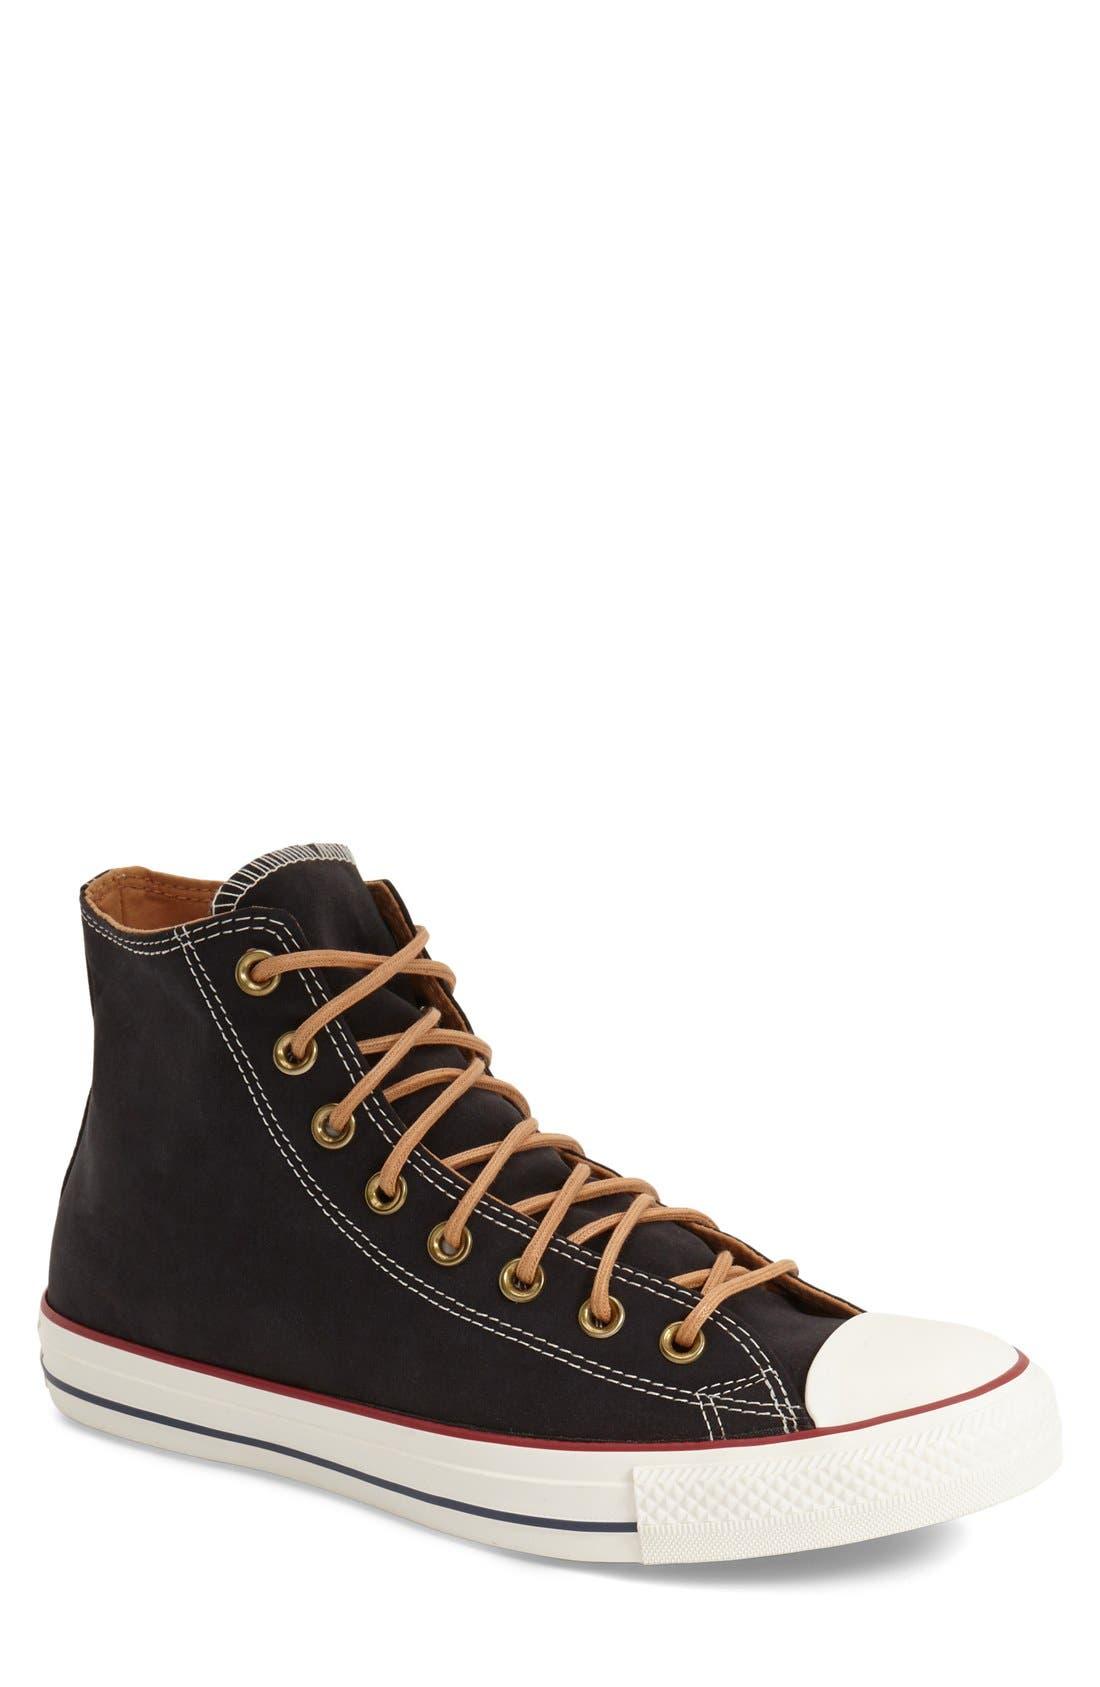 Alternate Image 1 Selected - Converse Chuck Taylor® All Star® High-Top Sneaker (Men)